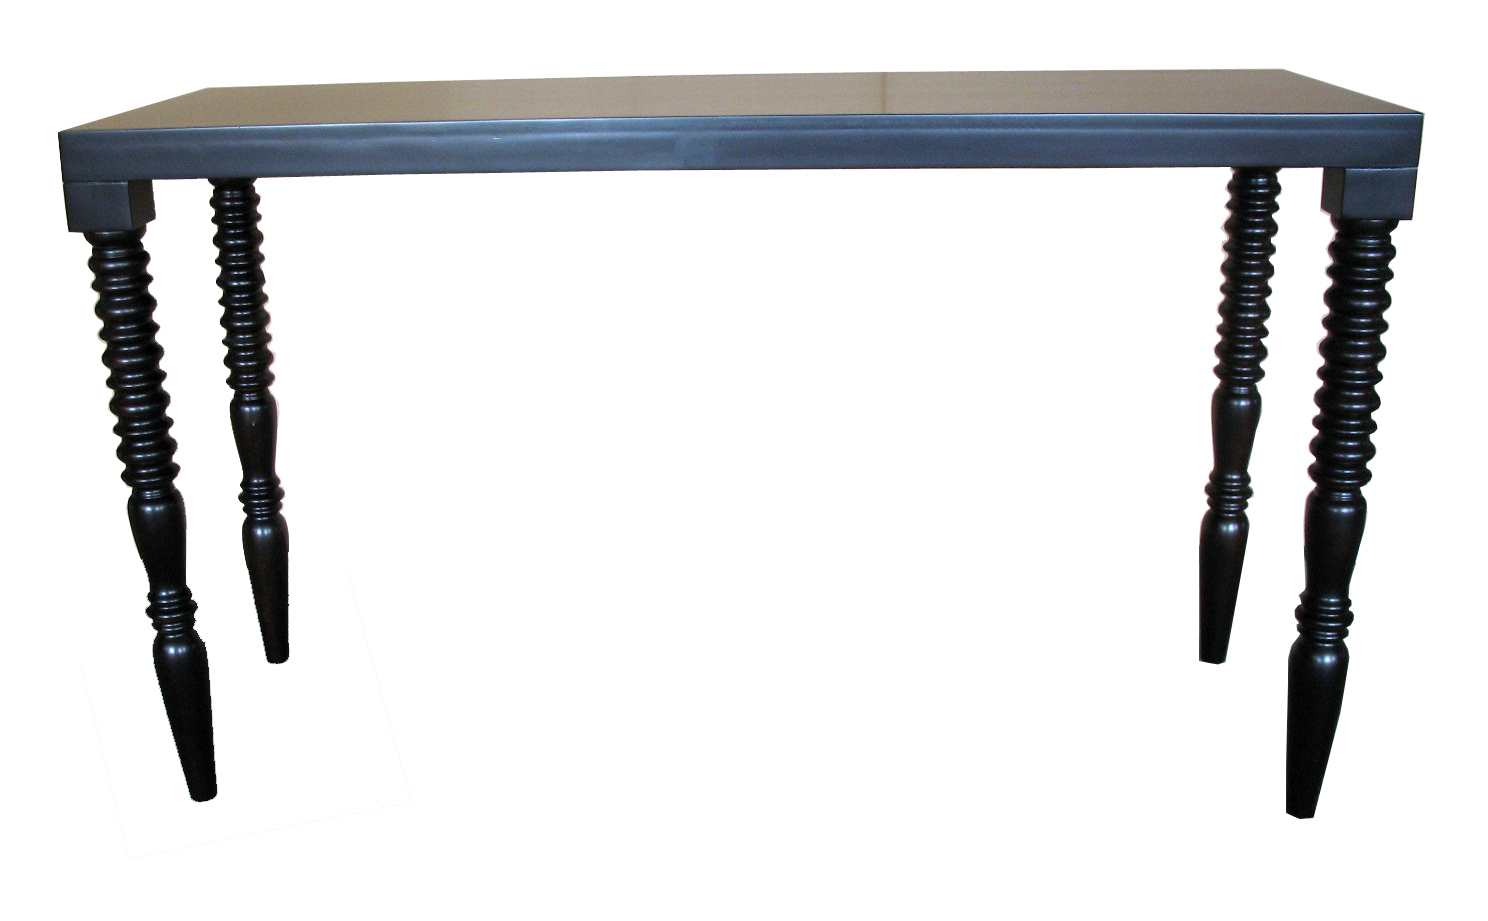 Tainoki Furniture For Sale Furniture Table Styles